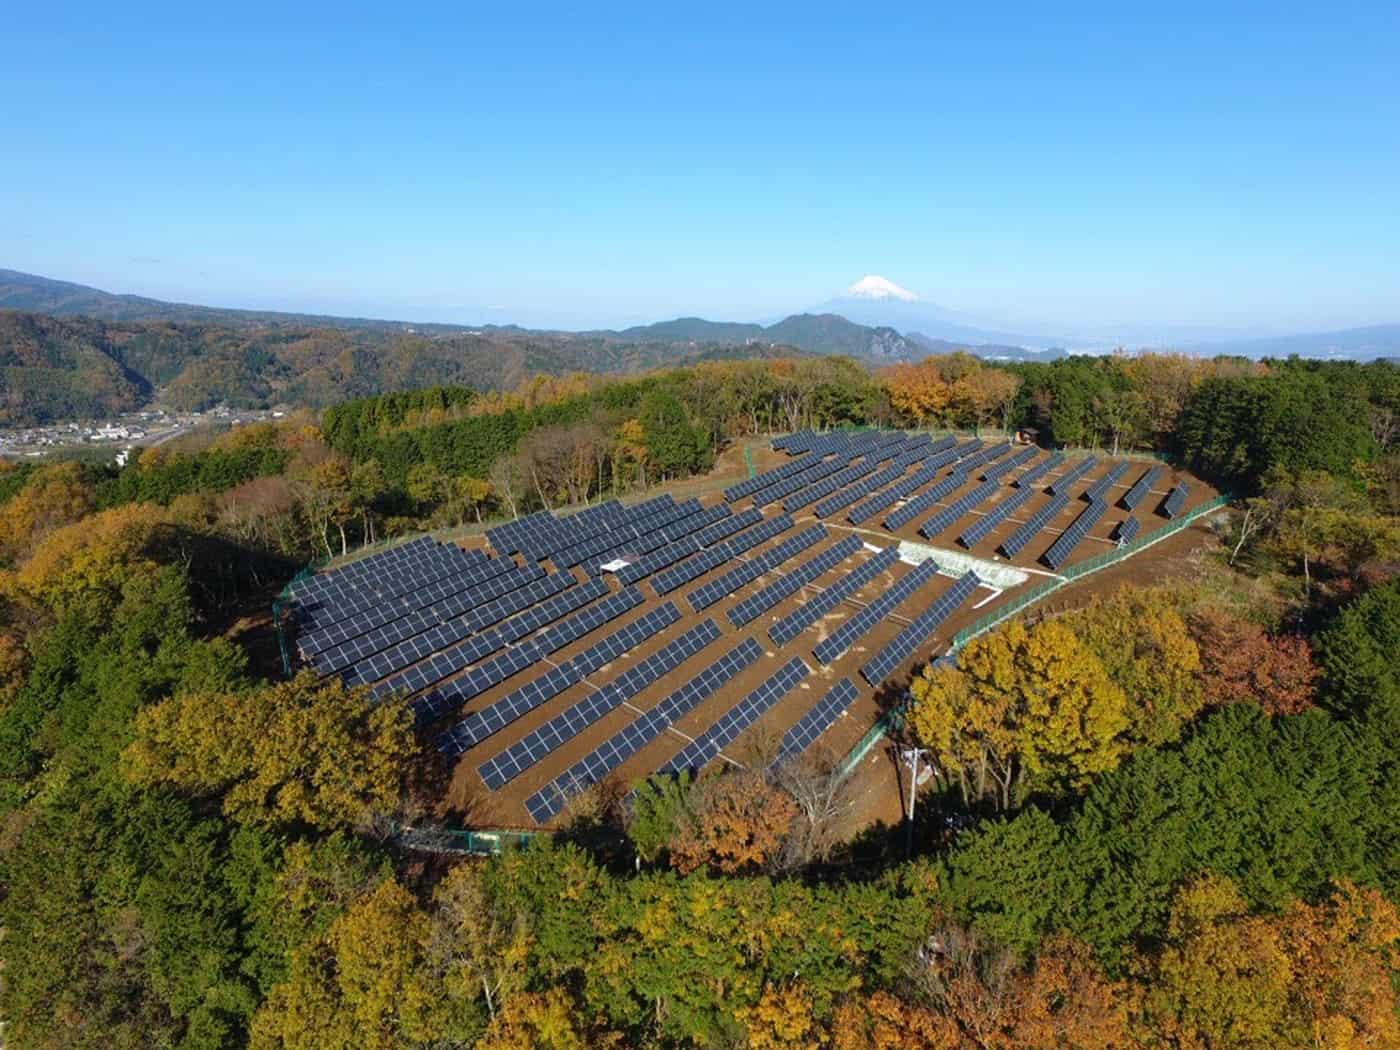 Bird's-eye view of solar panels from Mark Merner via Unsplash